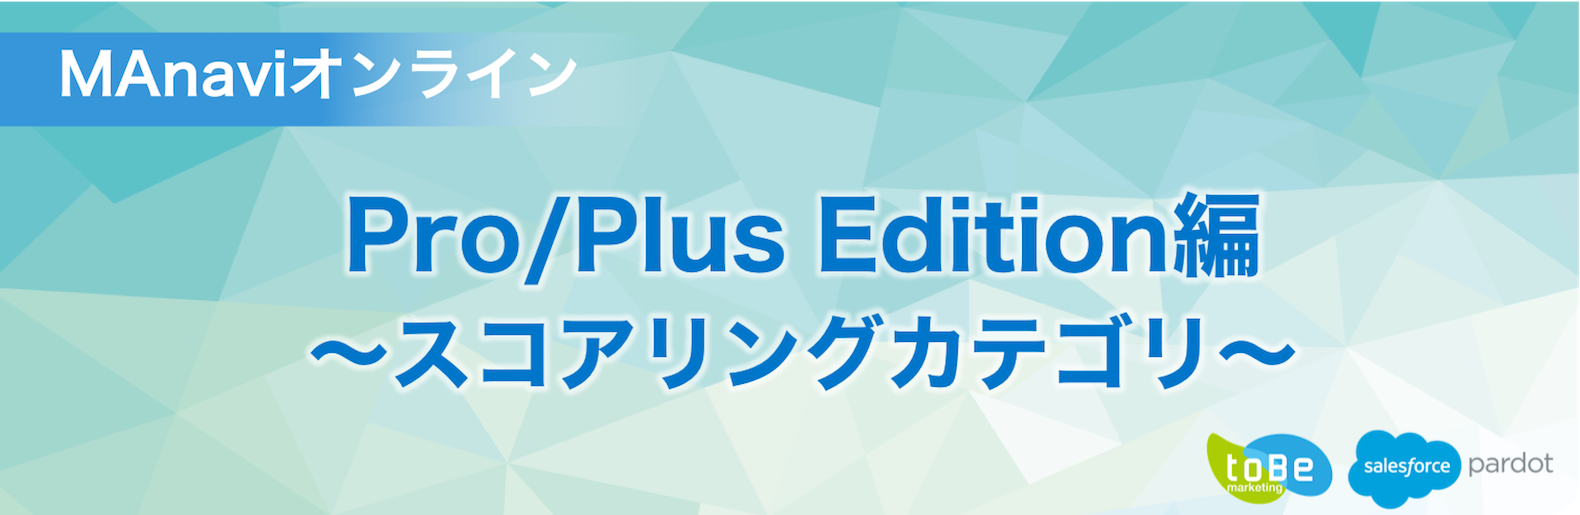 【MAnaviオンライン】Pro/Plus Edition編 スコアリングカテゴリ